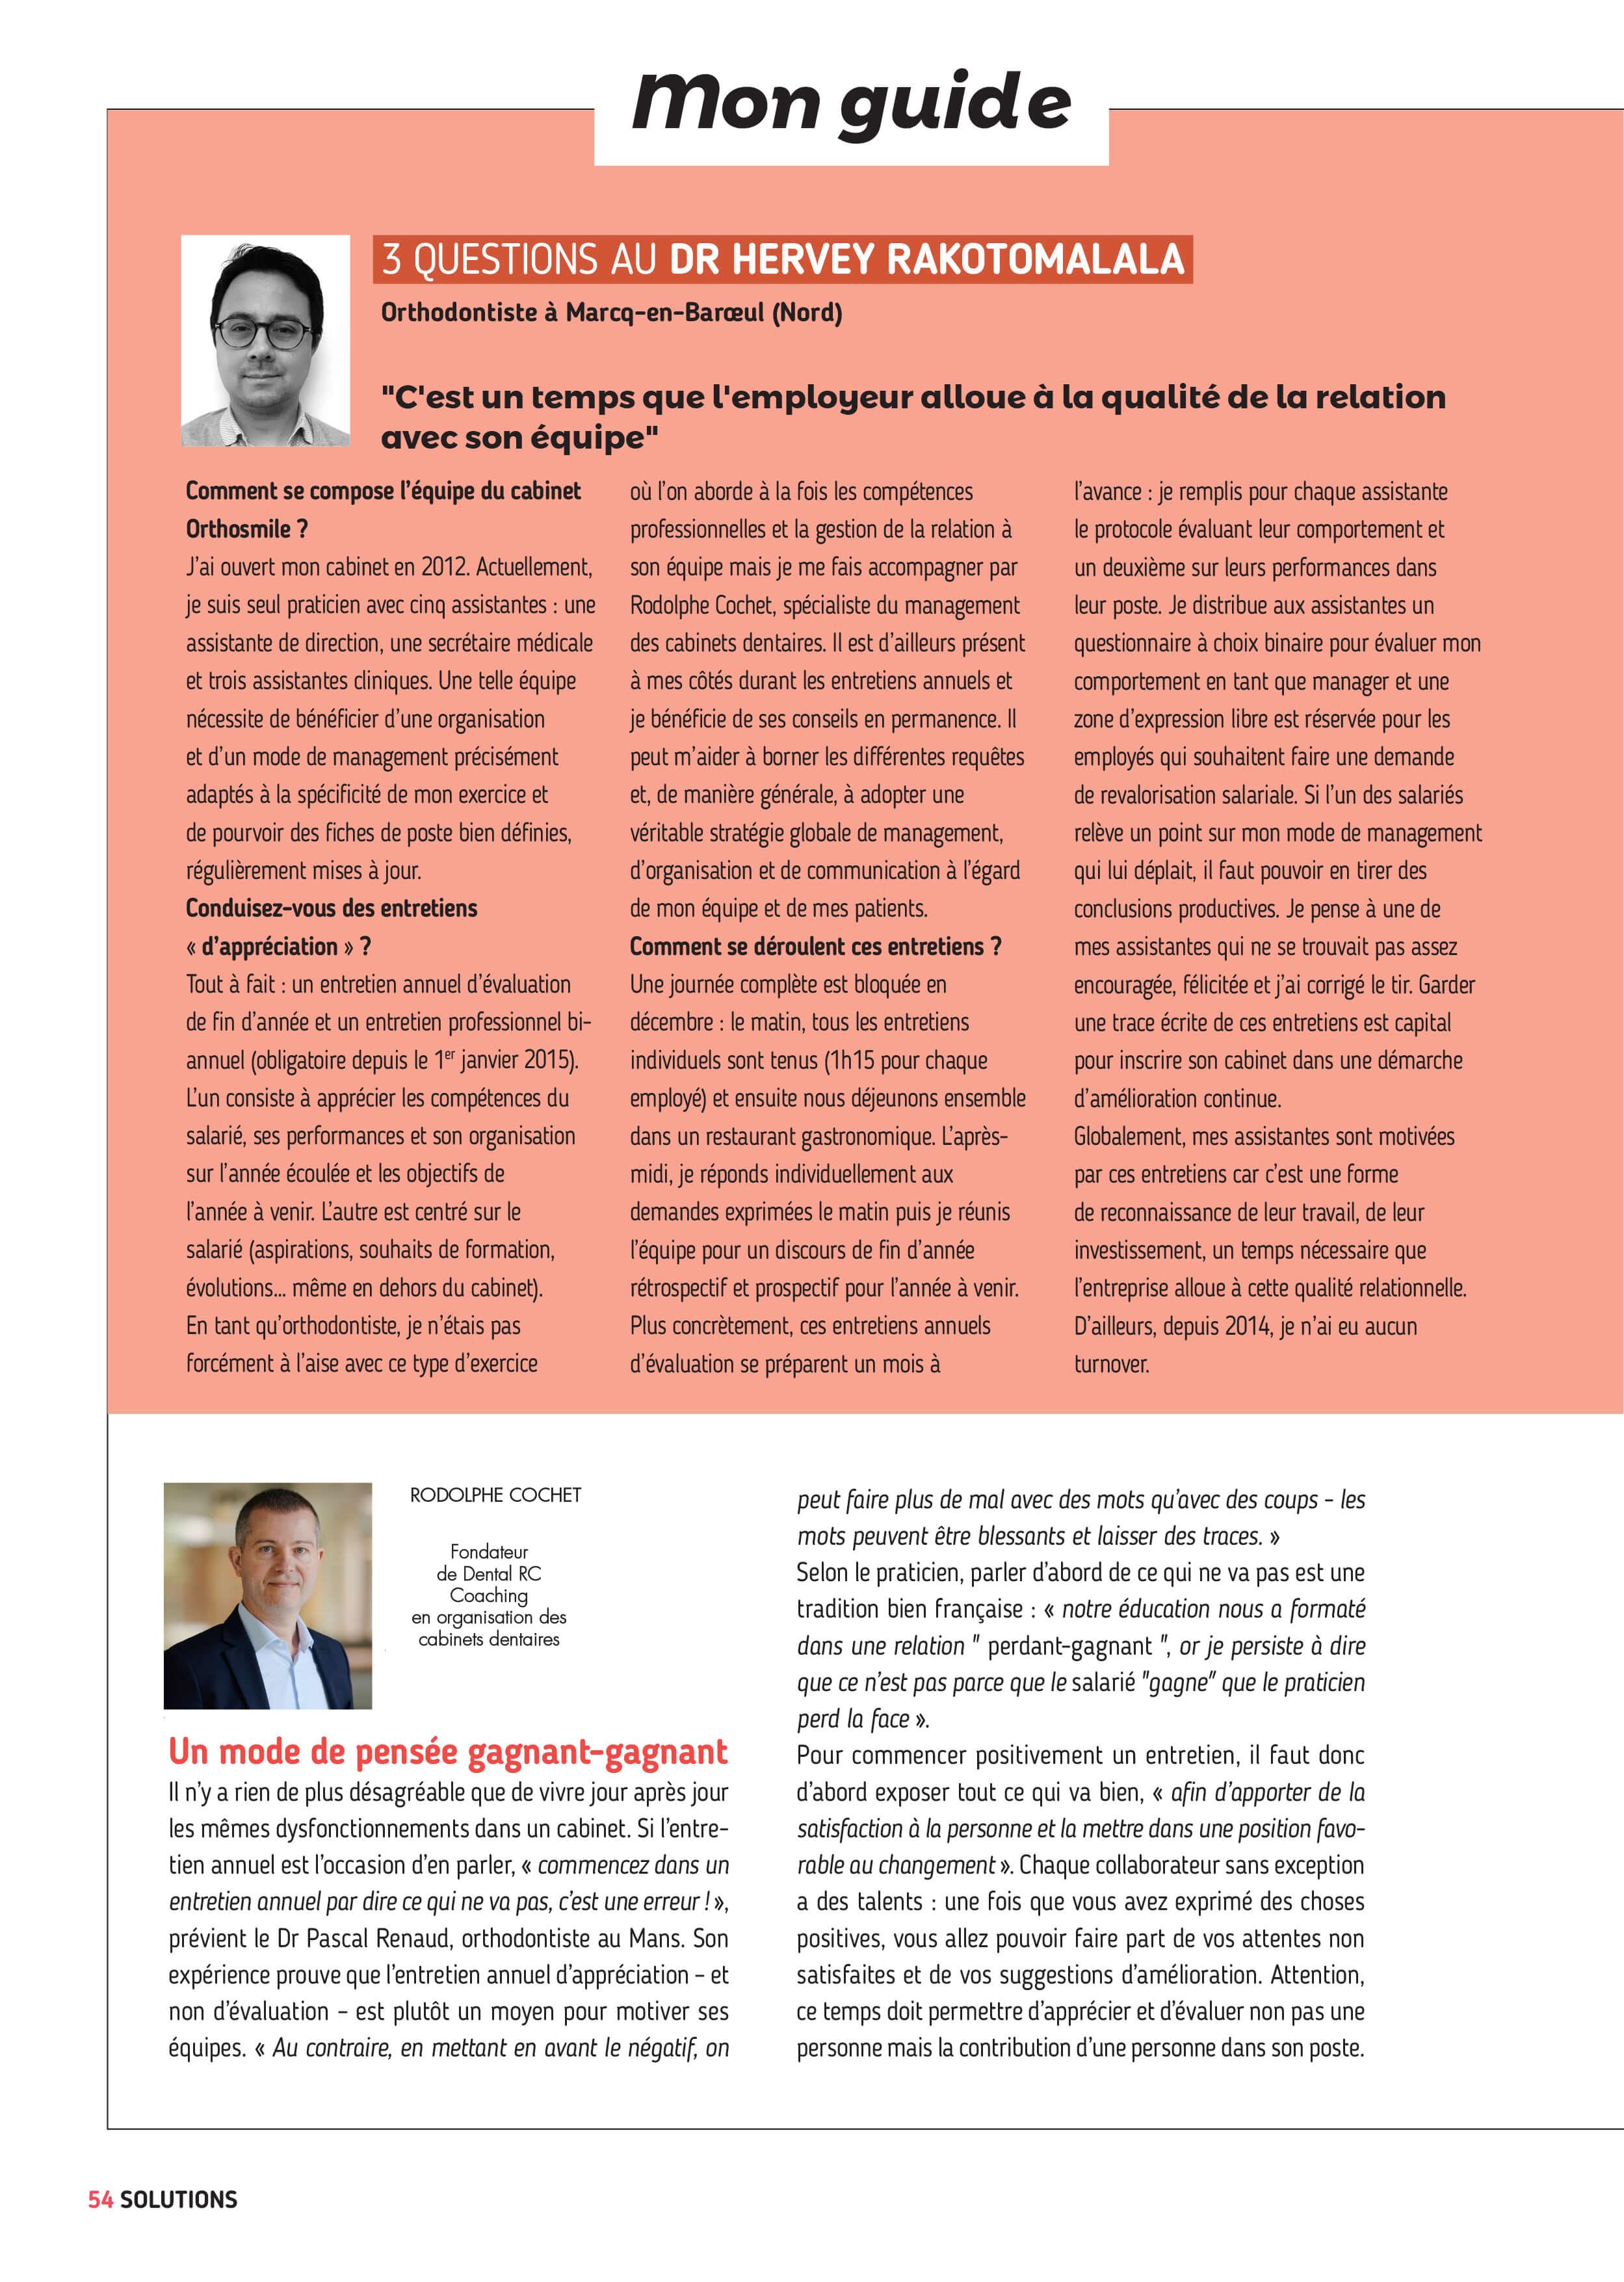 Le-coaching-managérial-en-orthodontie-3-questions-Docteur-Hervey-Rakotomalala.jpg